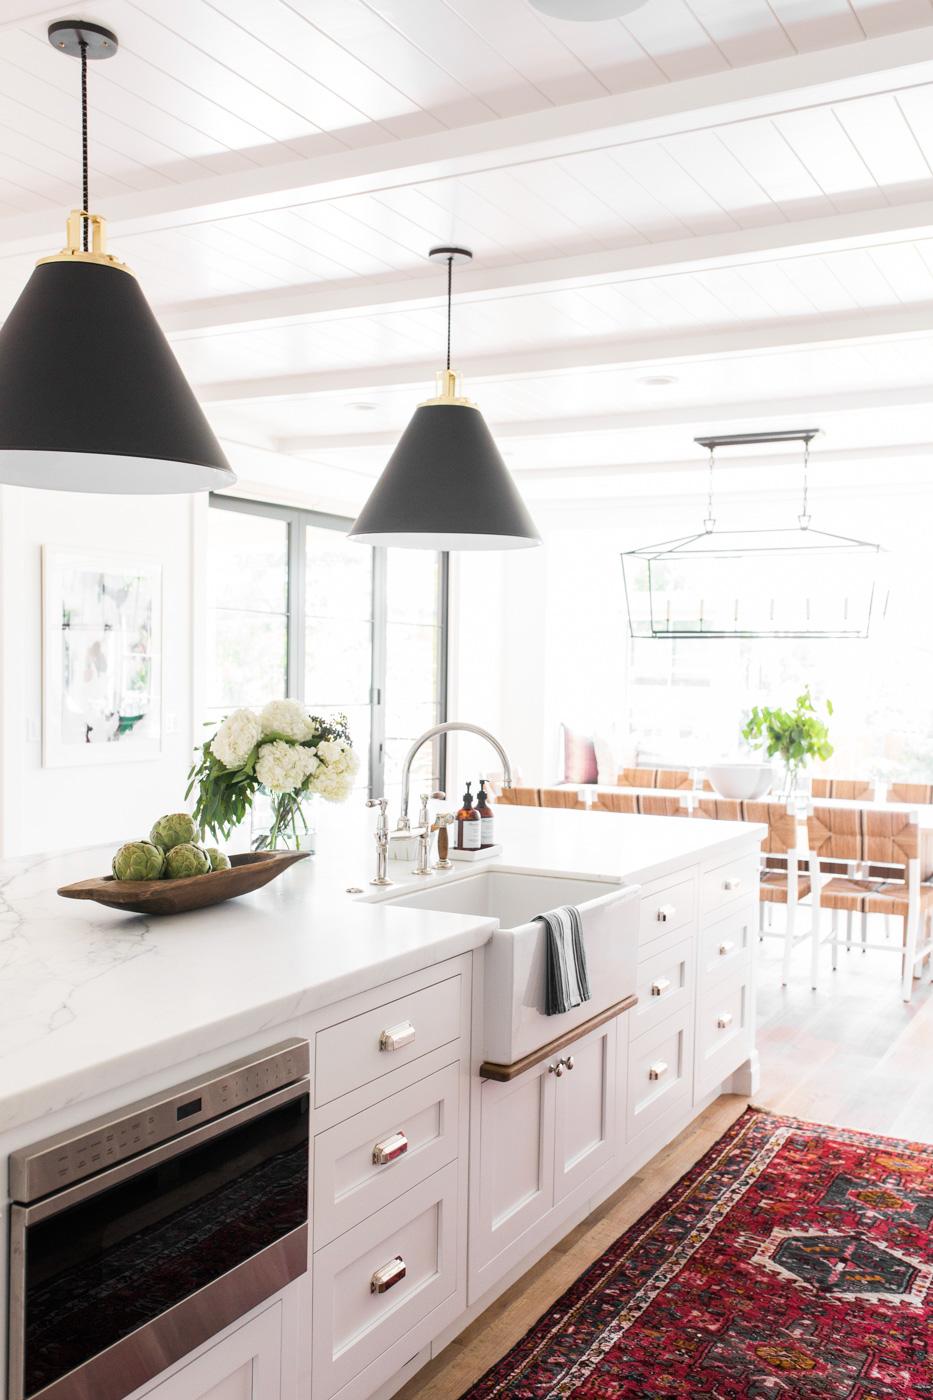 Design: Studio Mcgee Countertops: Marble